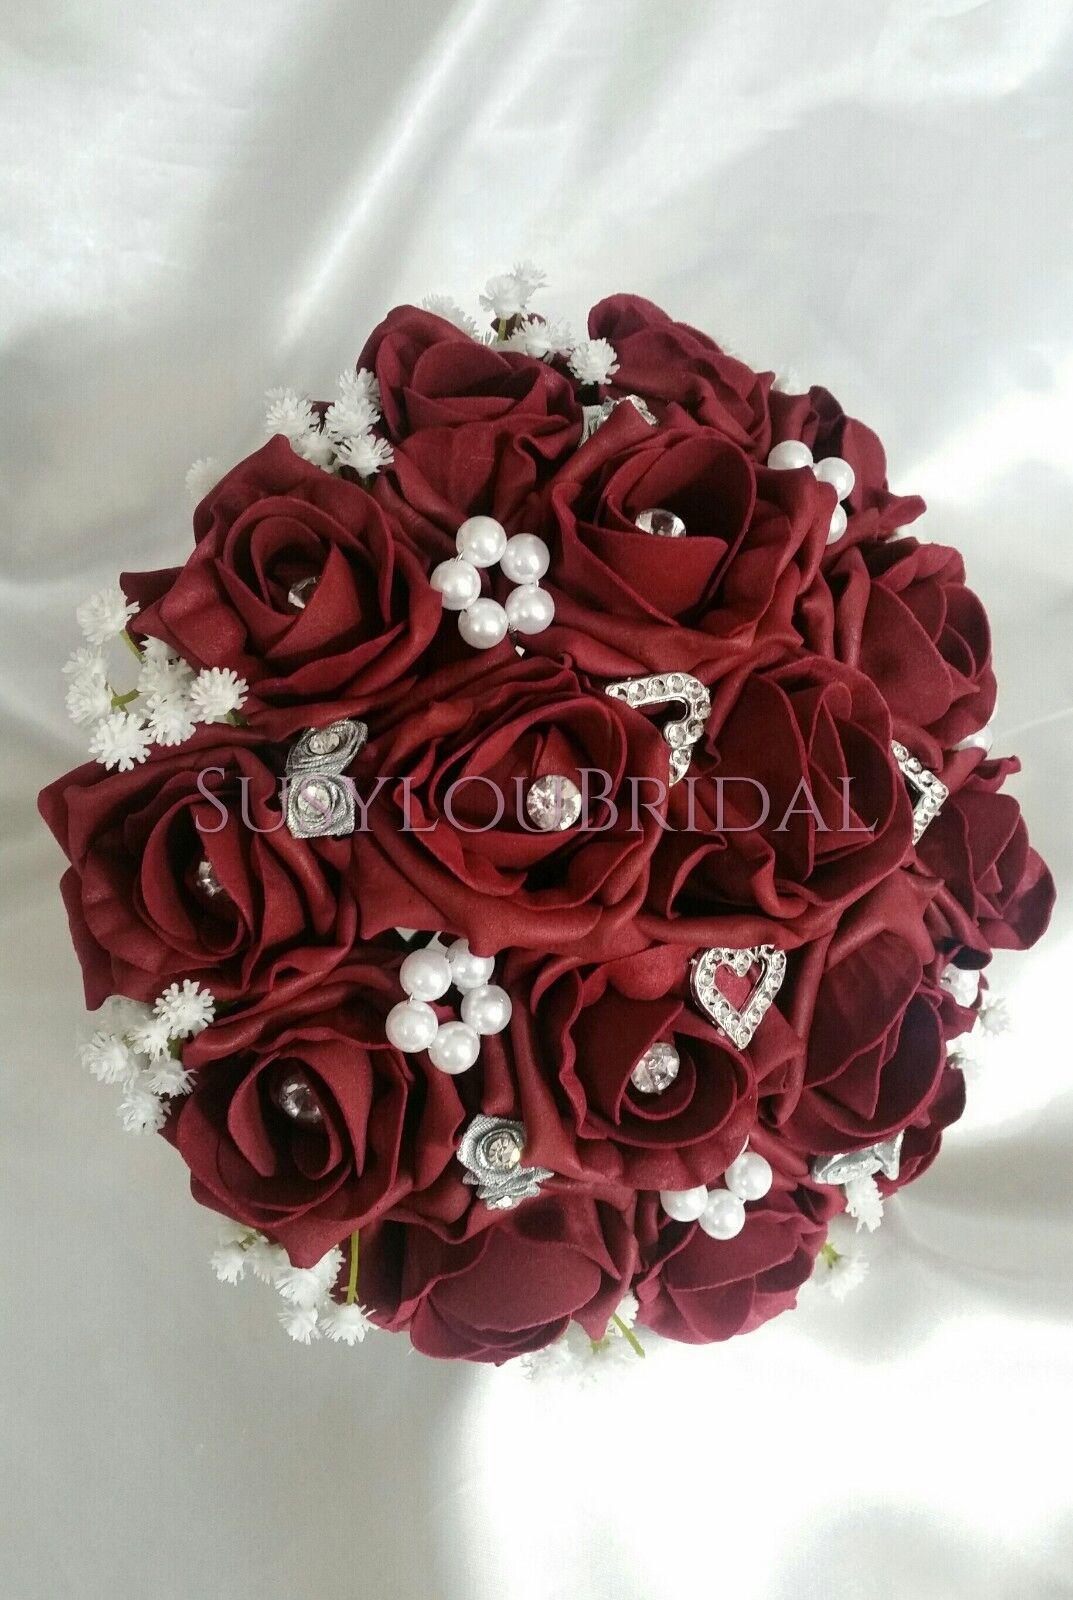 vendedor de Reino Unido 1000 Hot Pink Pétalos de Rosa-Boda-San Valentín Confeti